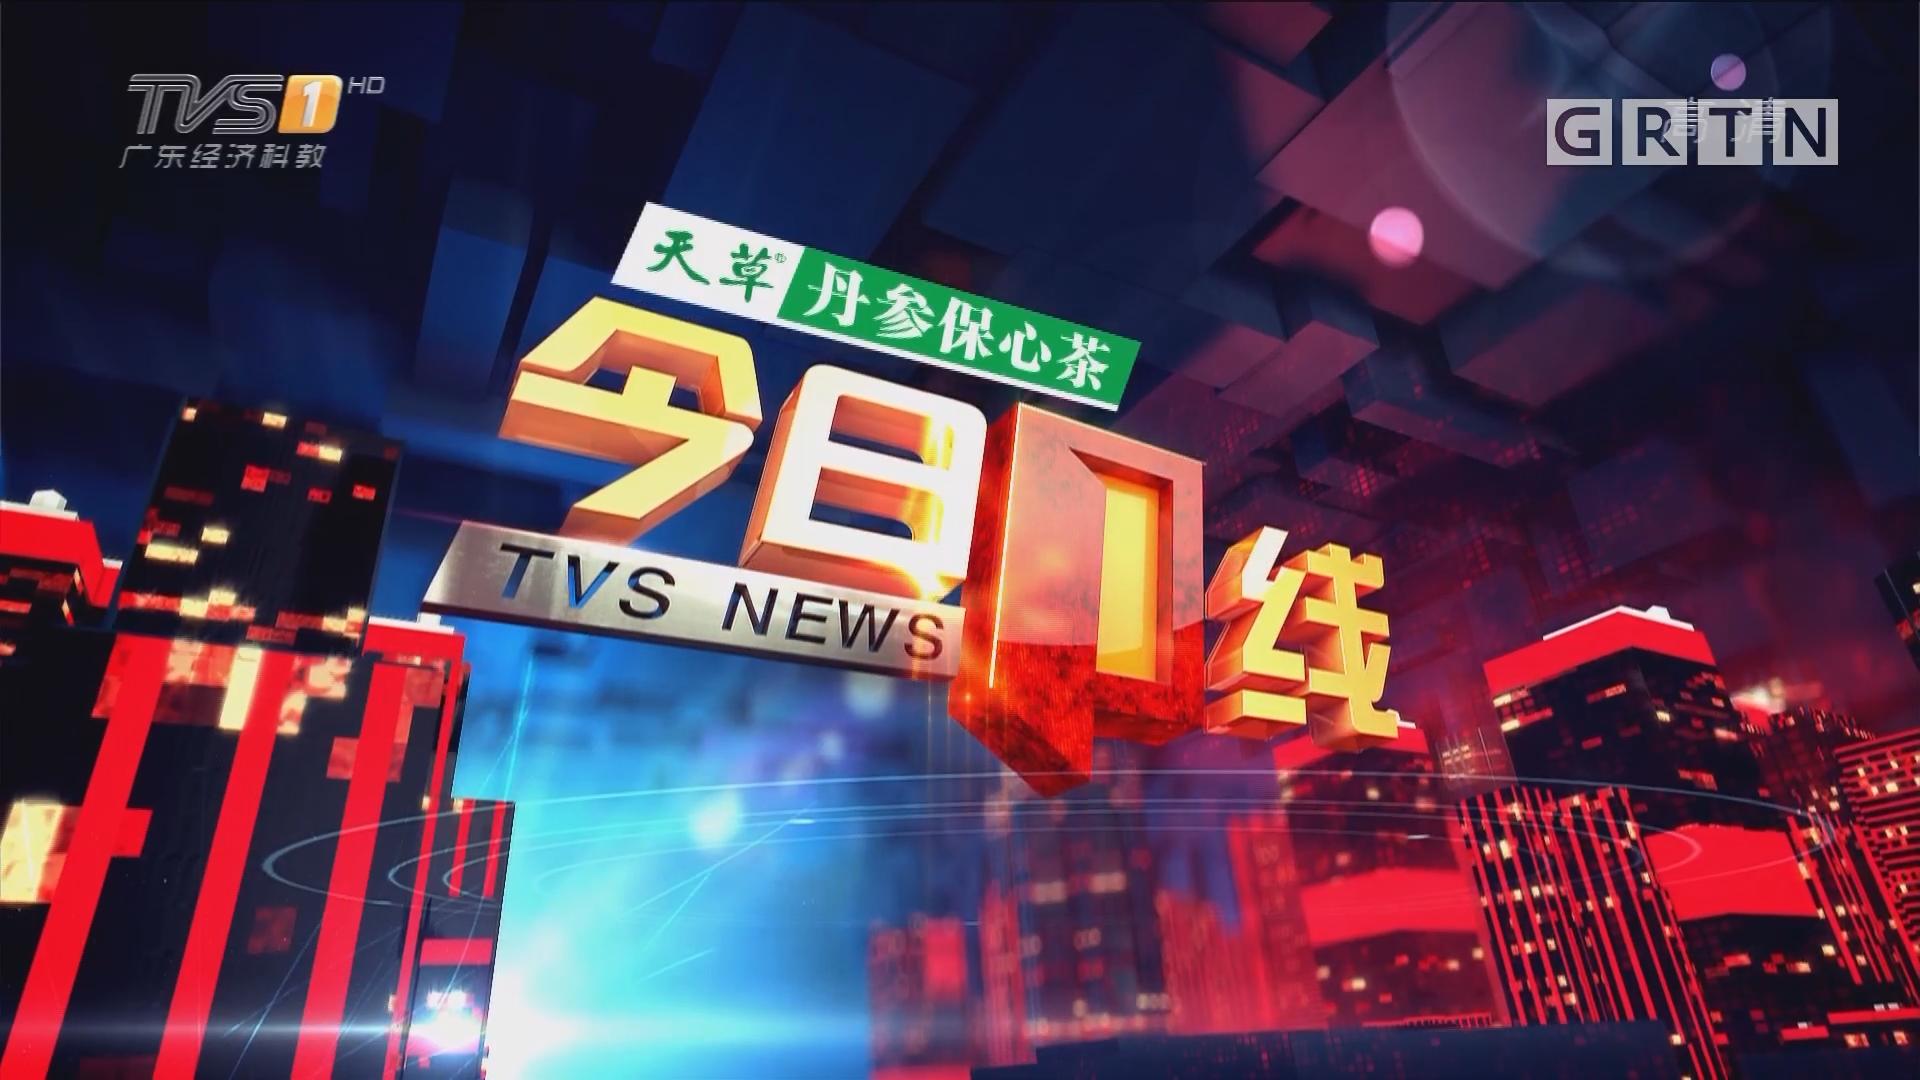 [HD][2018-10-03]今日一线:欢度国庆 肇庆:首届西瓜节 游客比拼吃西瓜